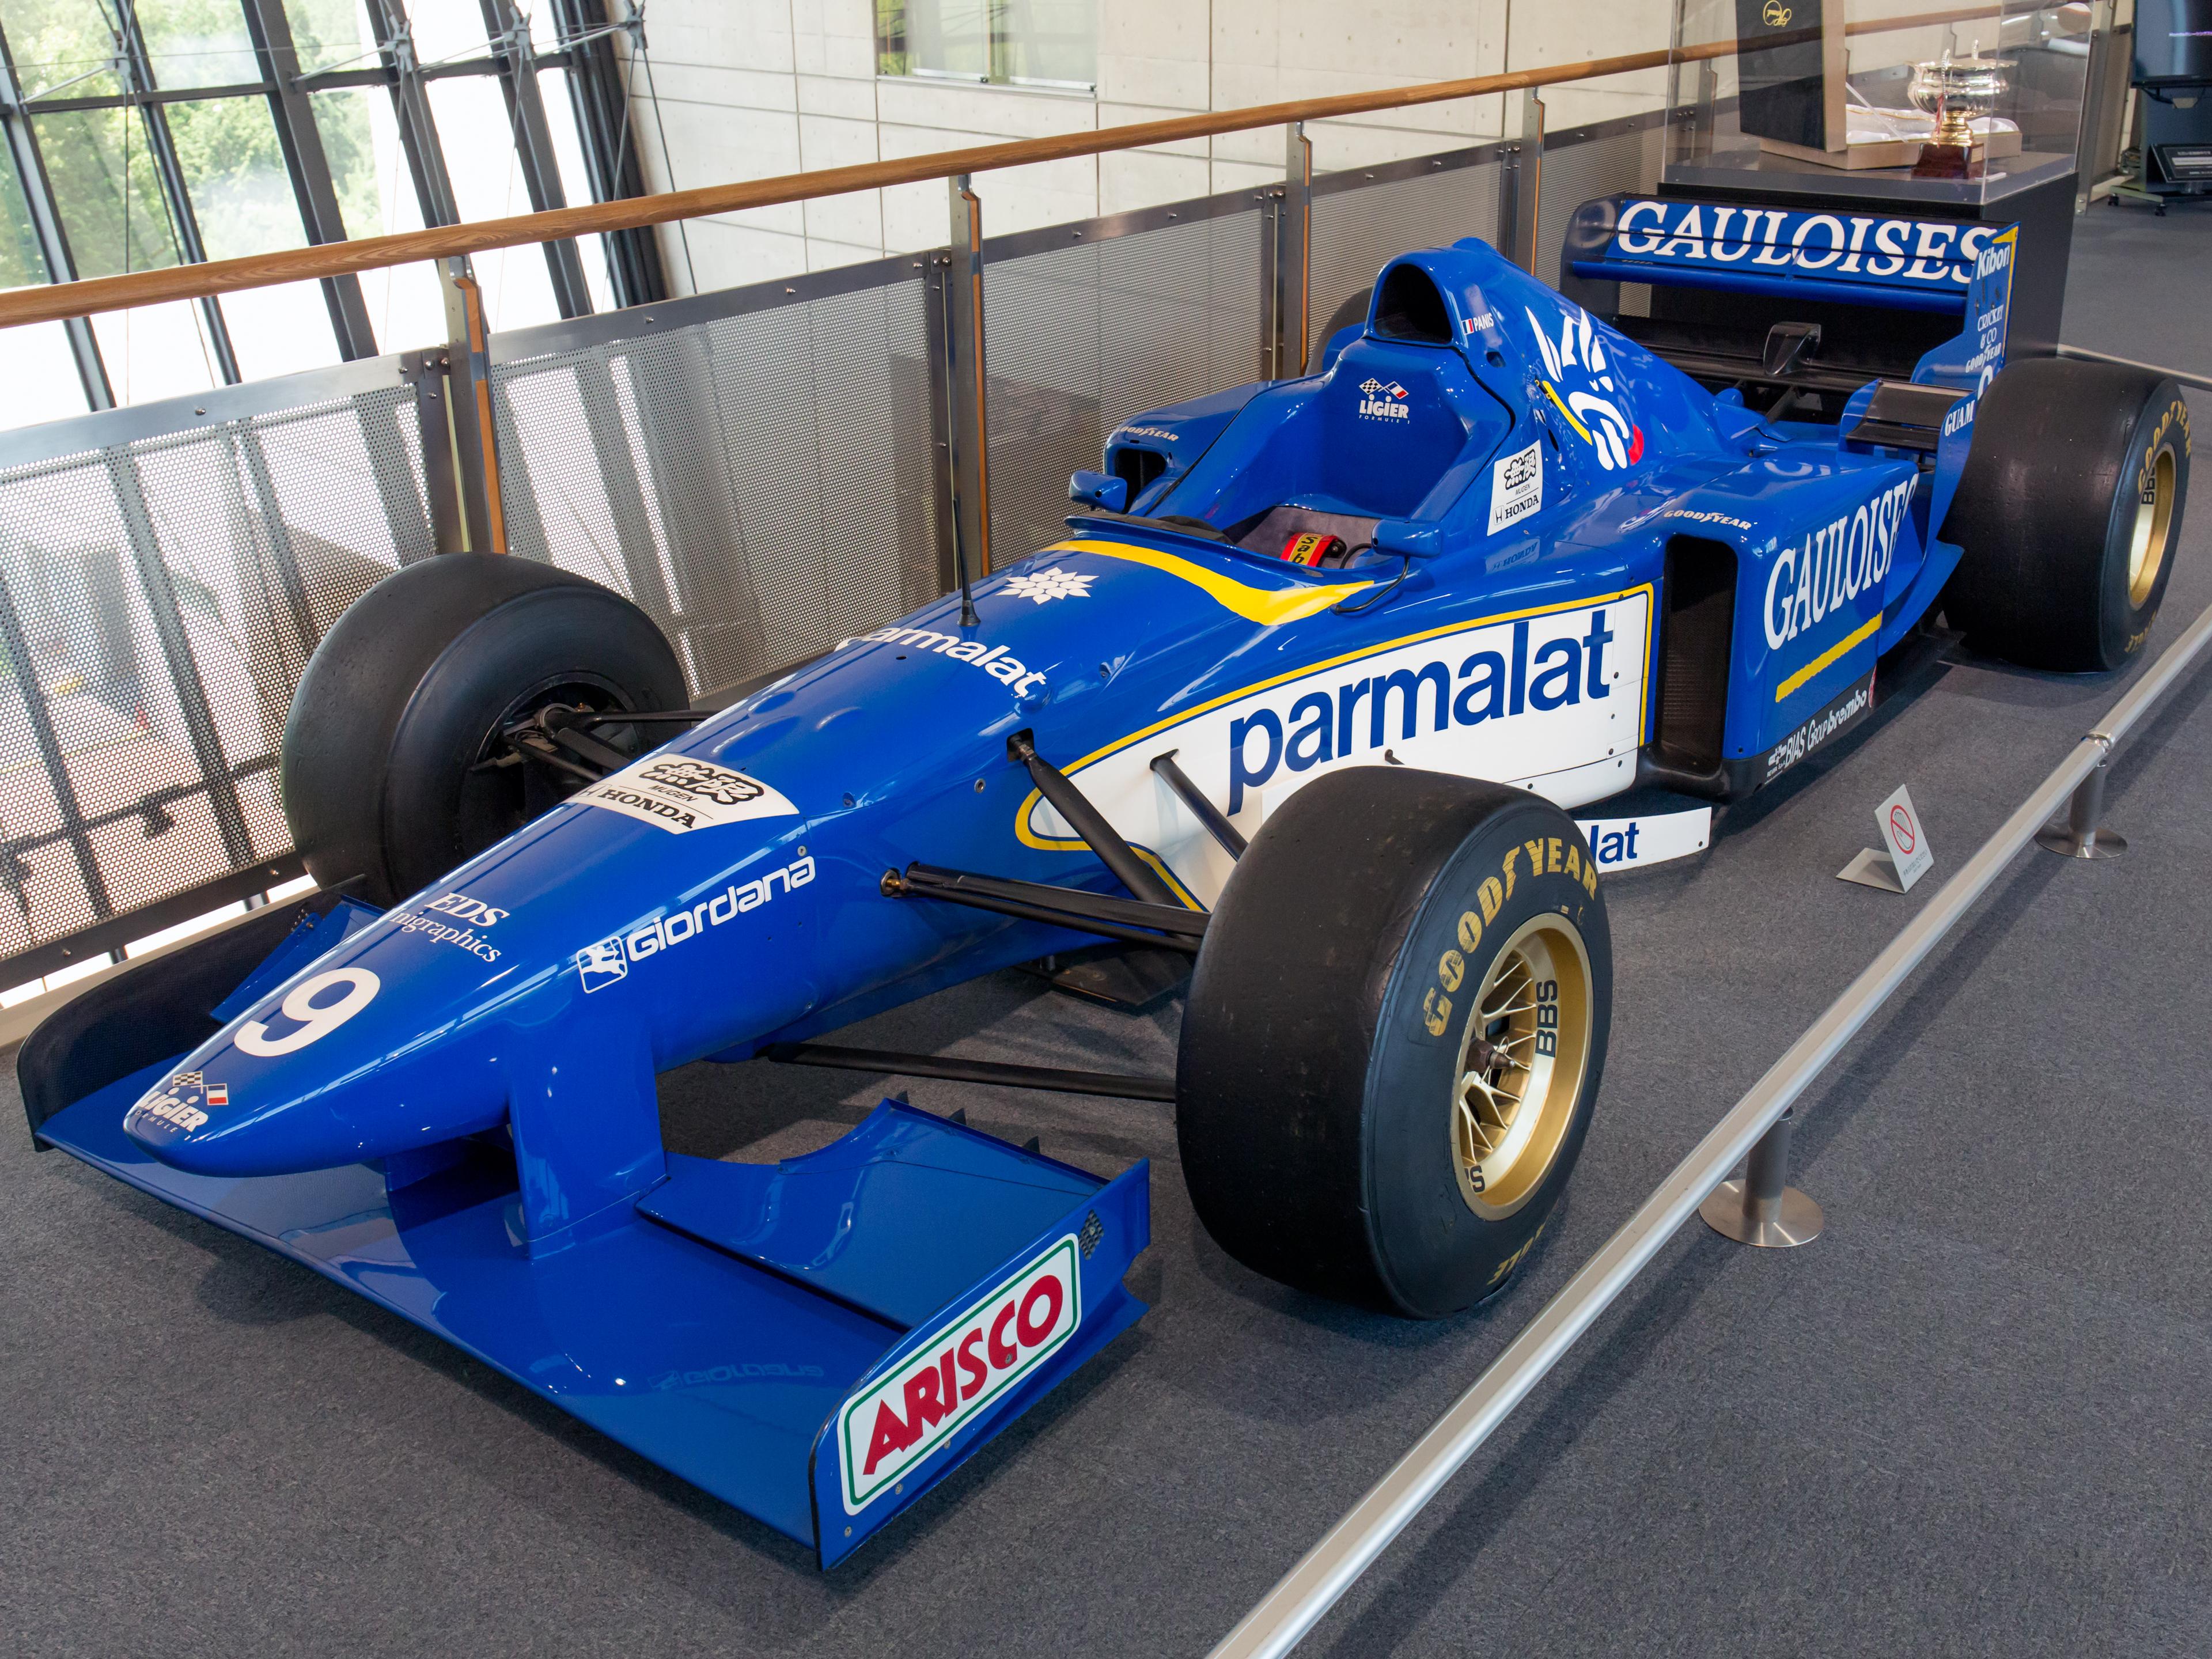 Ligier_JS43_front-left_Honda_Collection_Hall.jpg